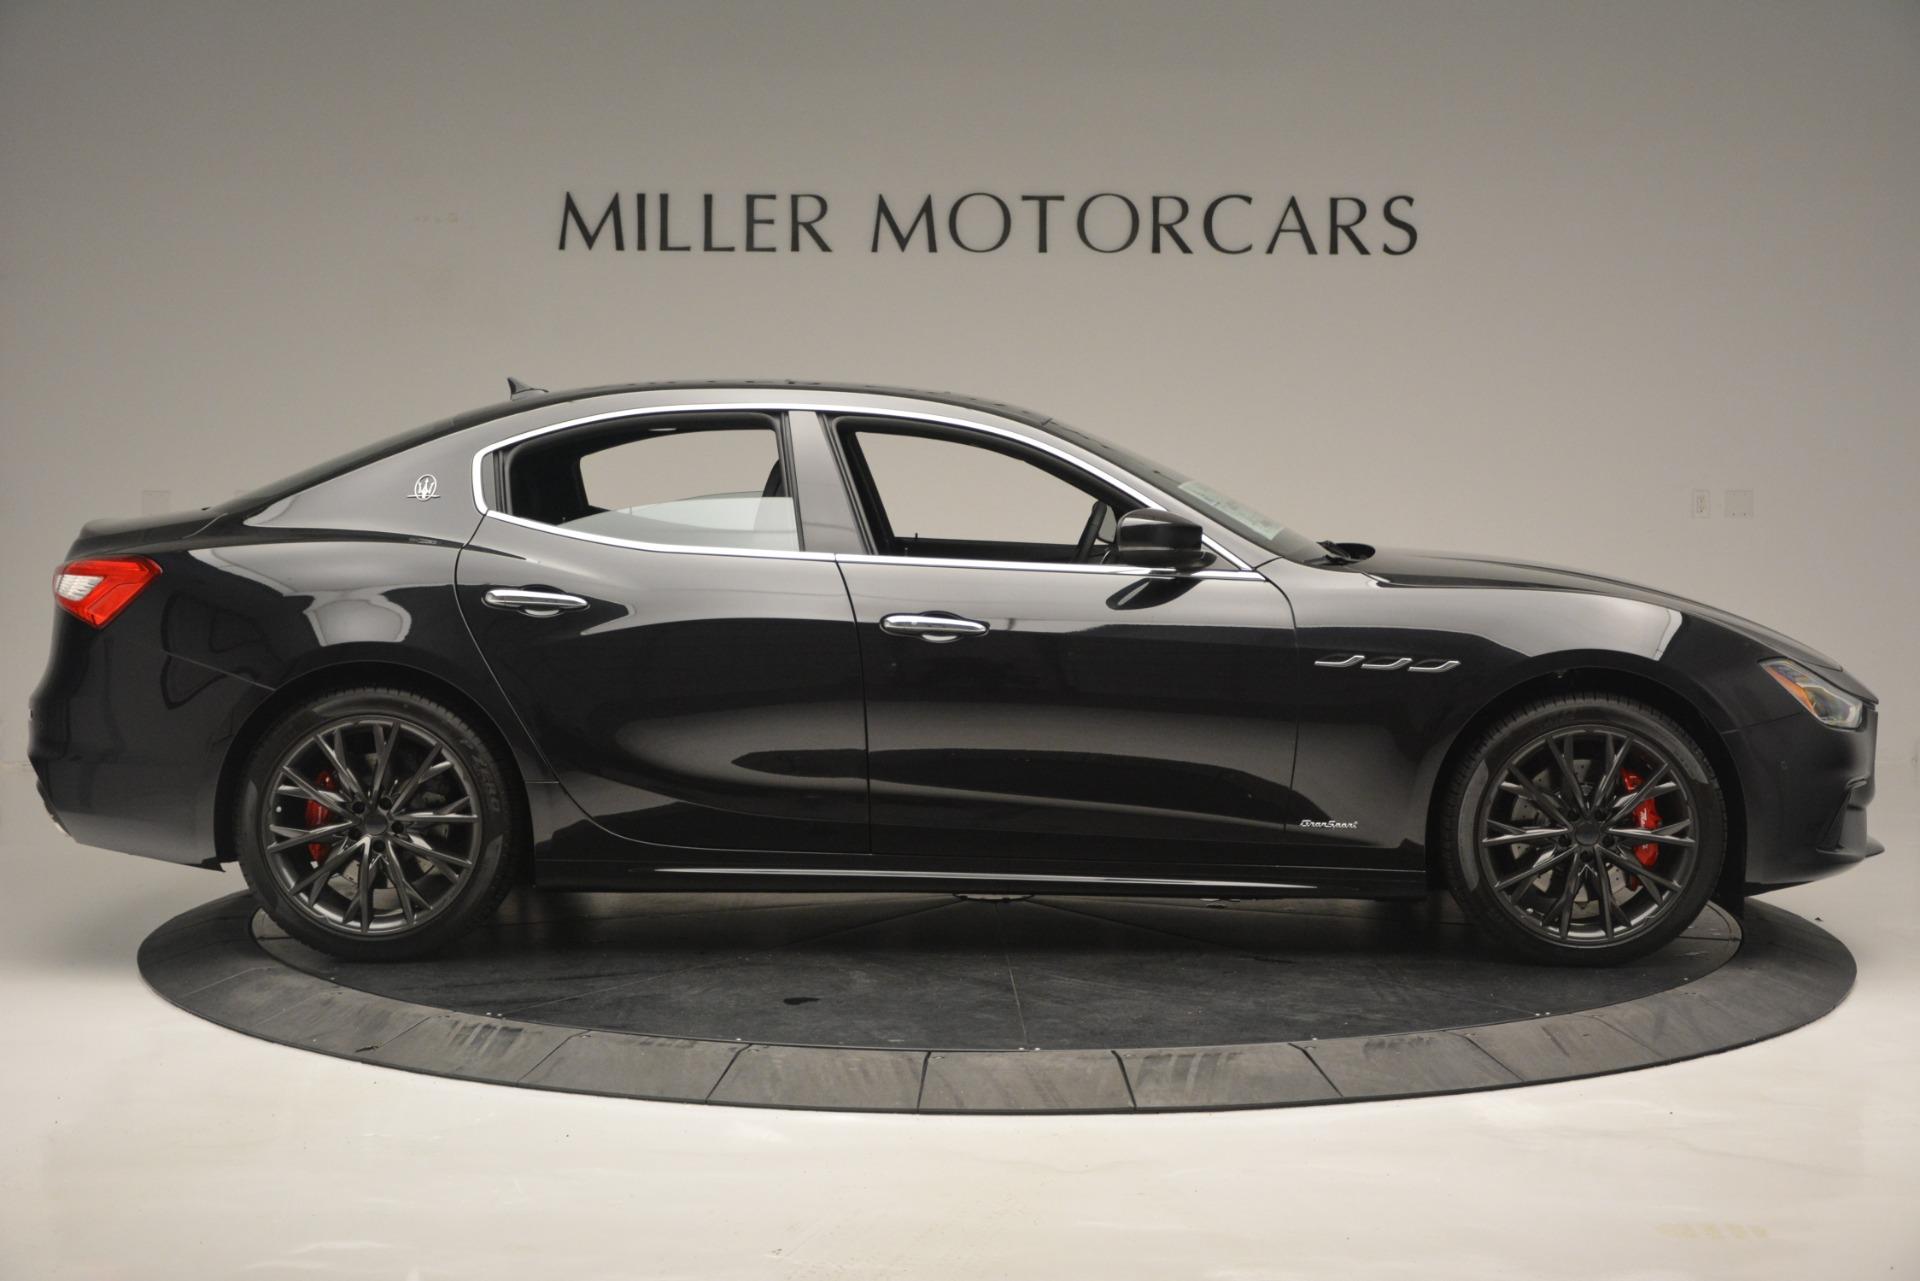 New 2019 Maserati Ghibli S Q4 GranSport For Sale In Greenwich, CT 2635_p9